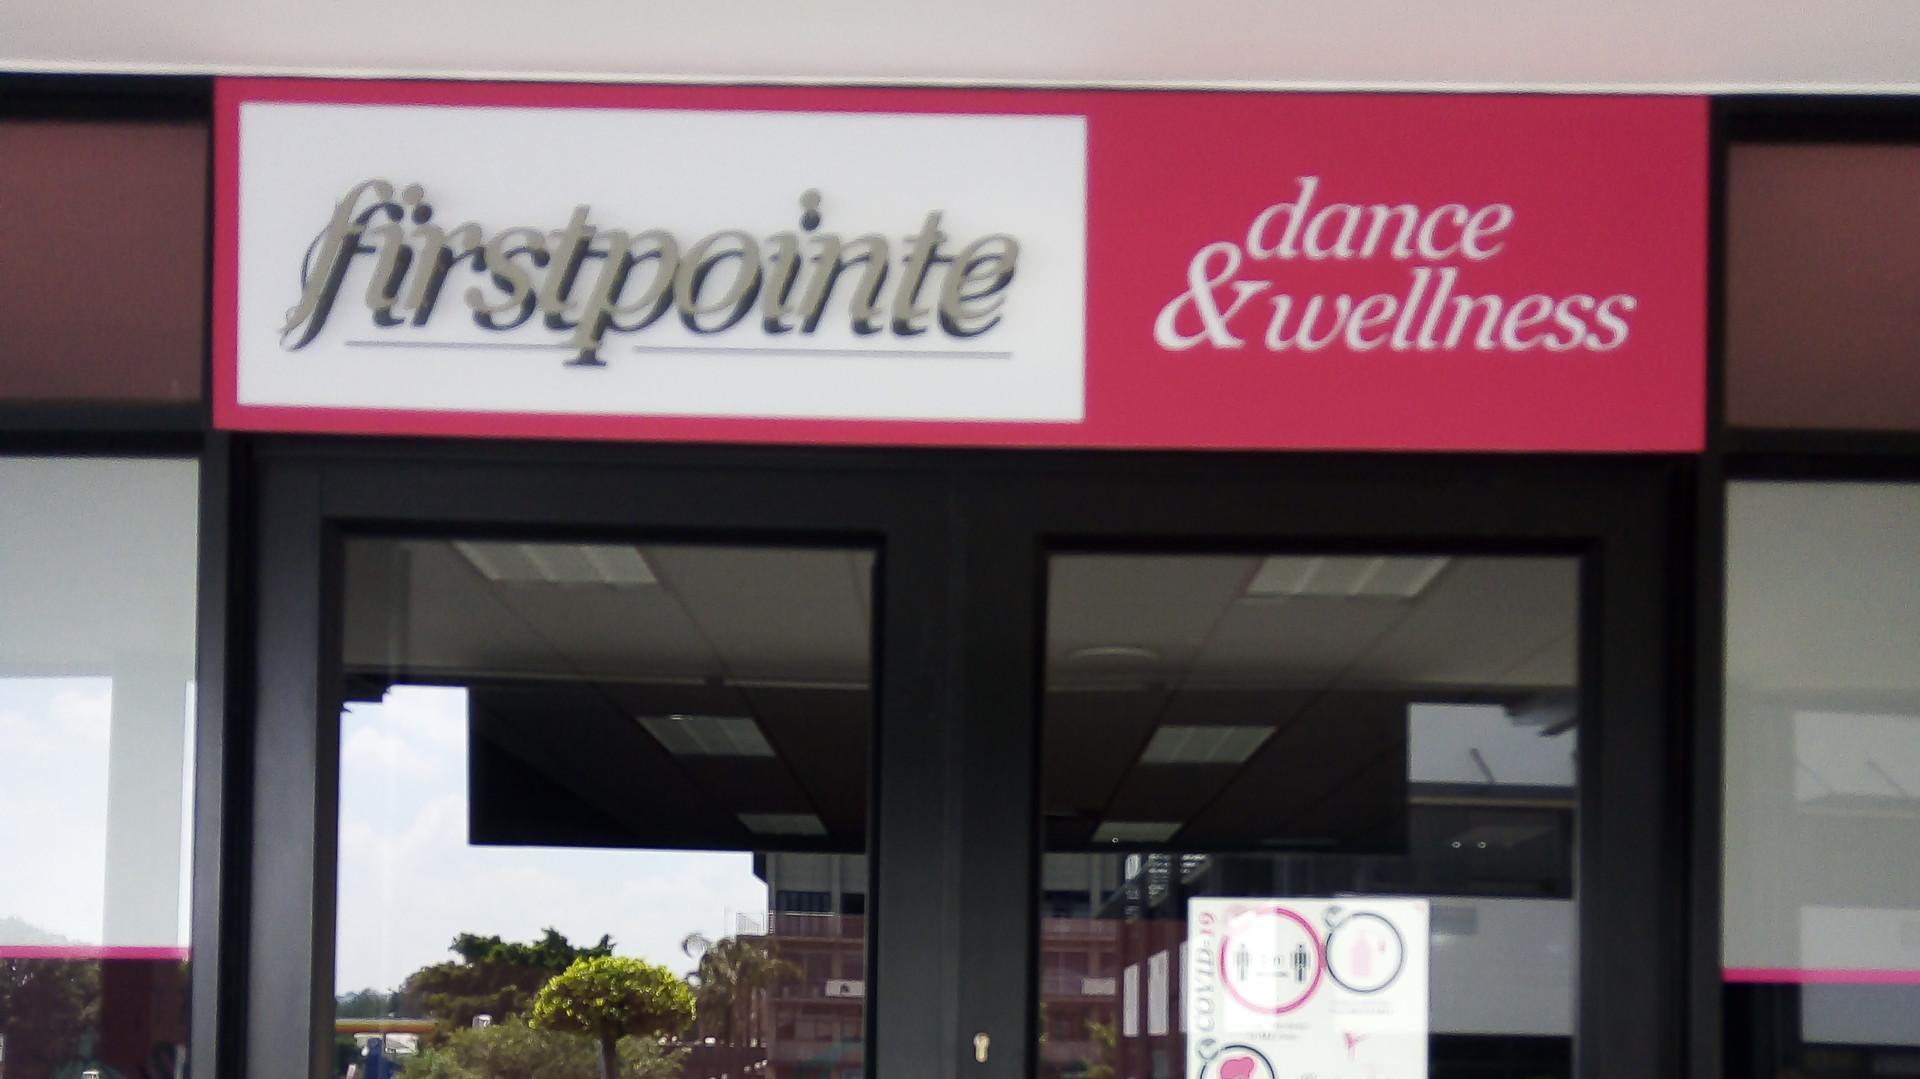 Firstpointe Dance & Wellness Studio